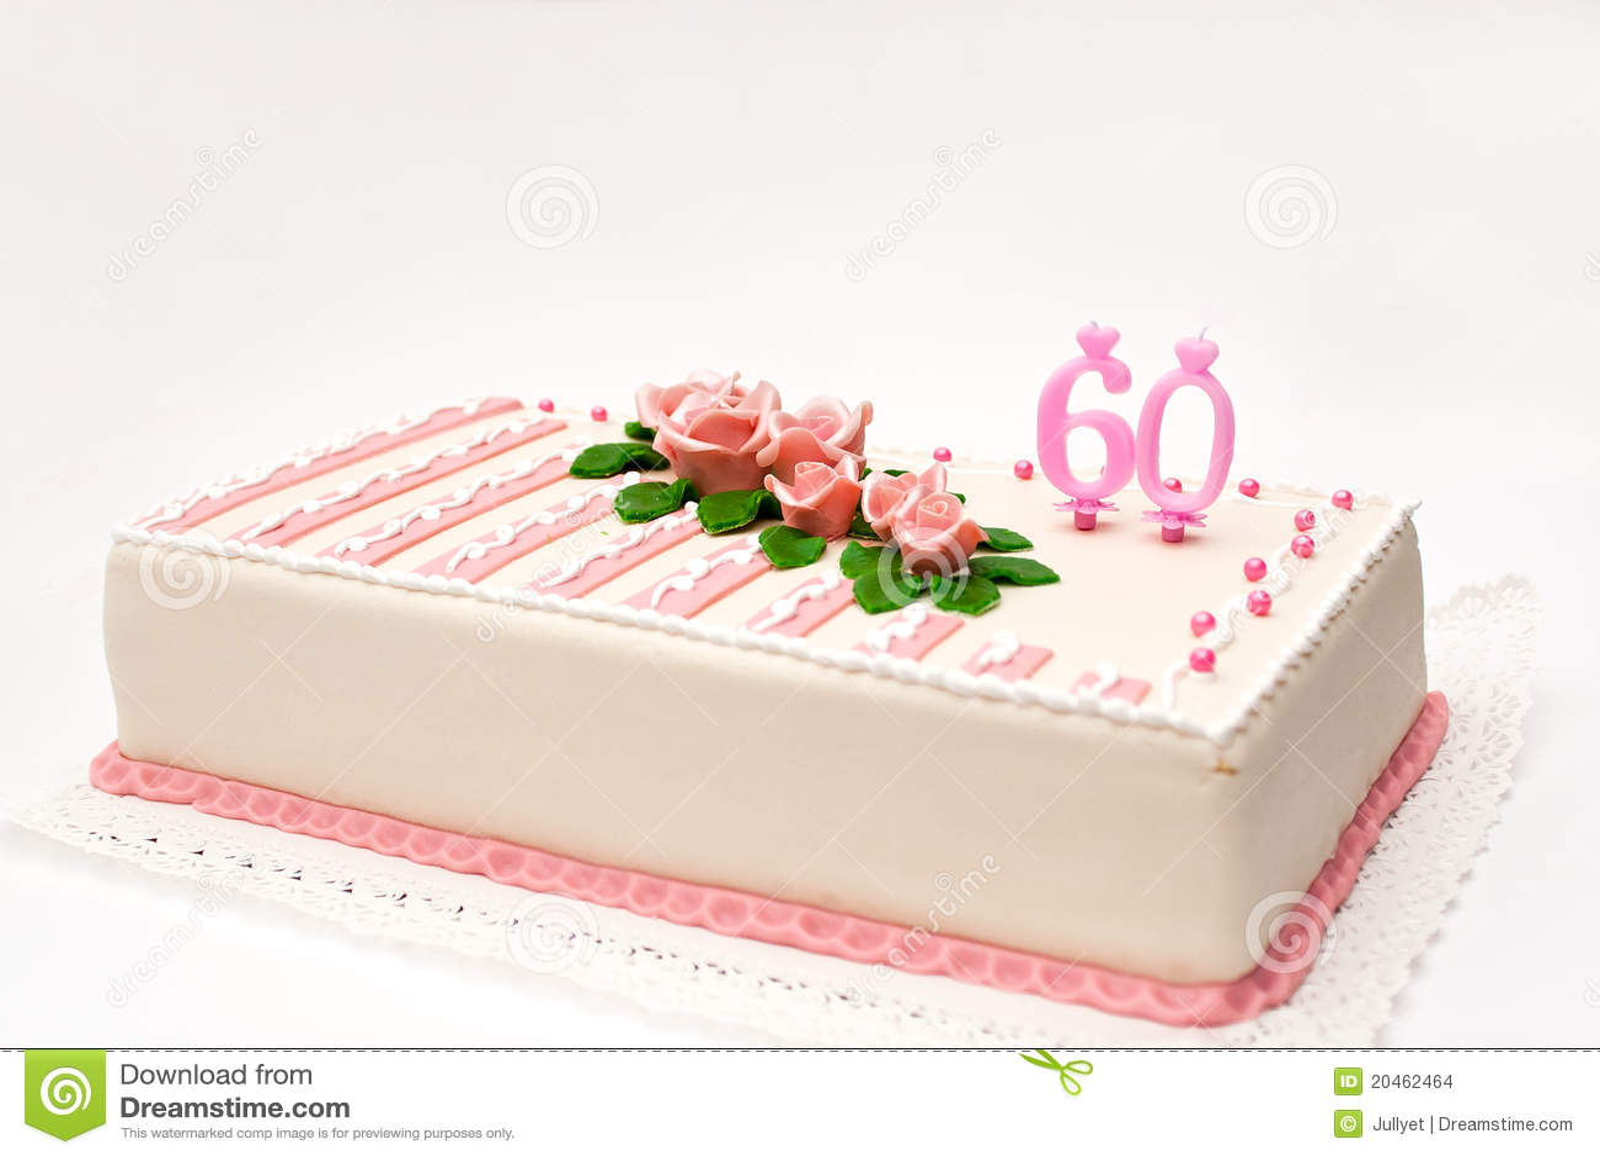 60th Birthday Cake Decorating Ideas